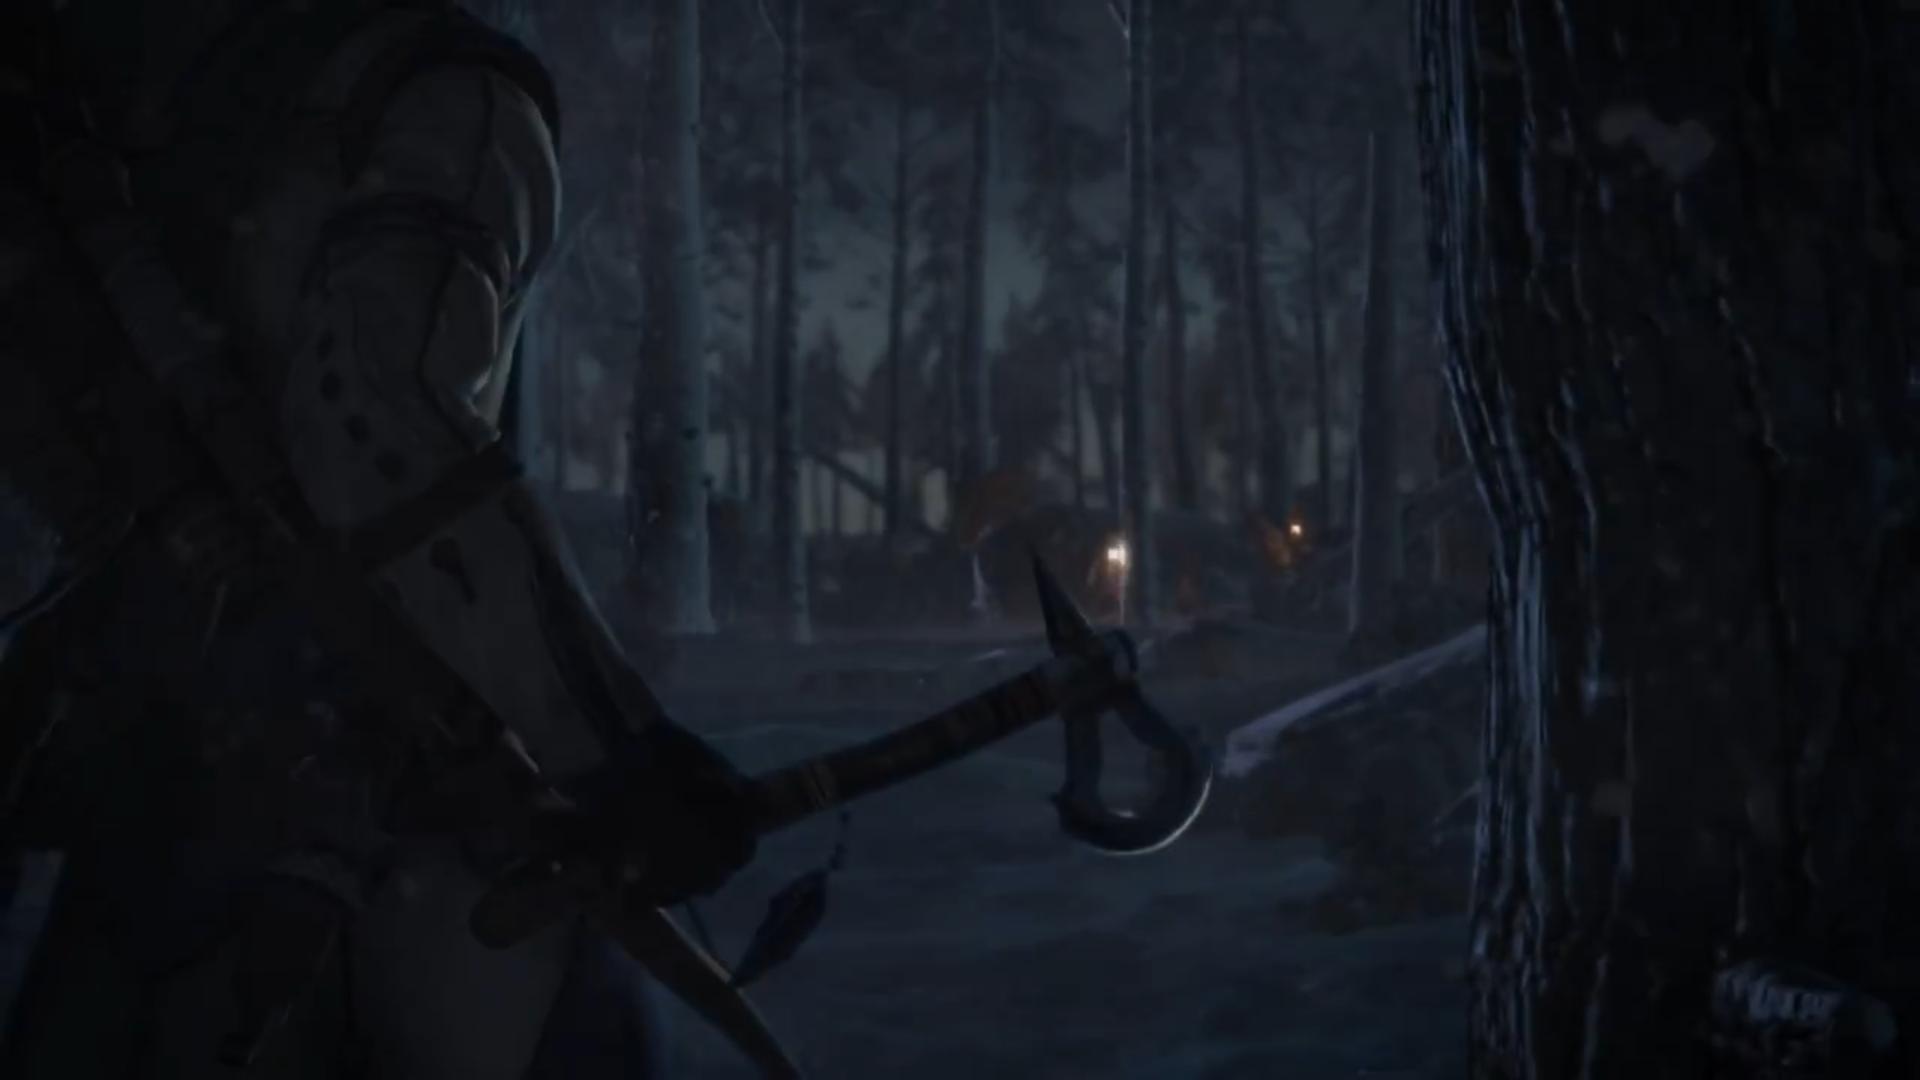 Assassin's Creed 3 - Rozbor prvního traileru 61675